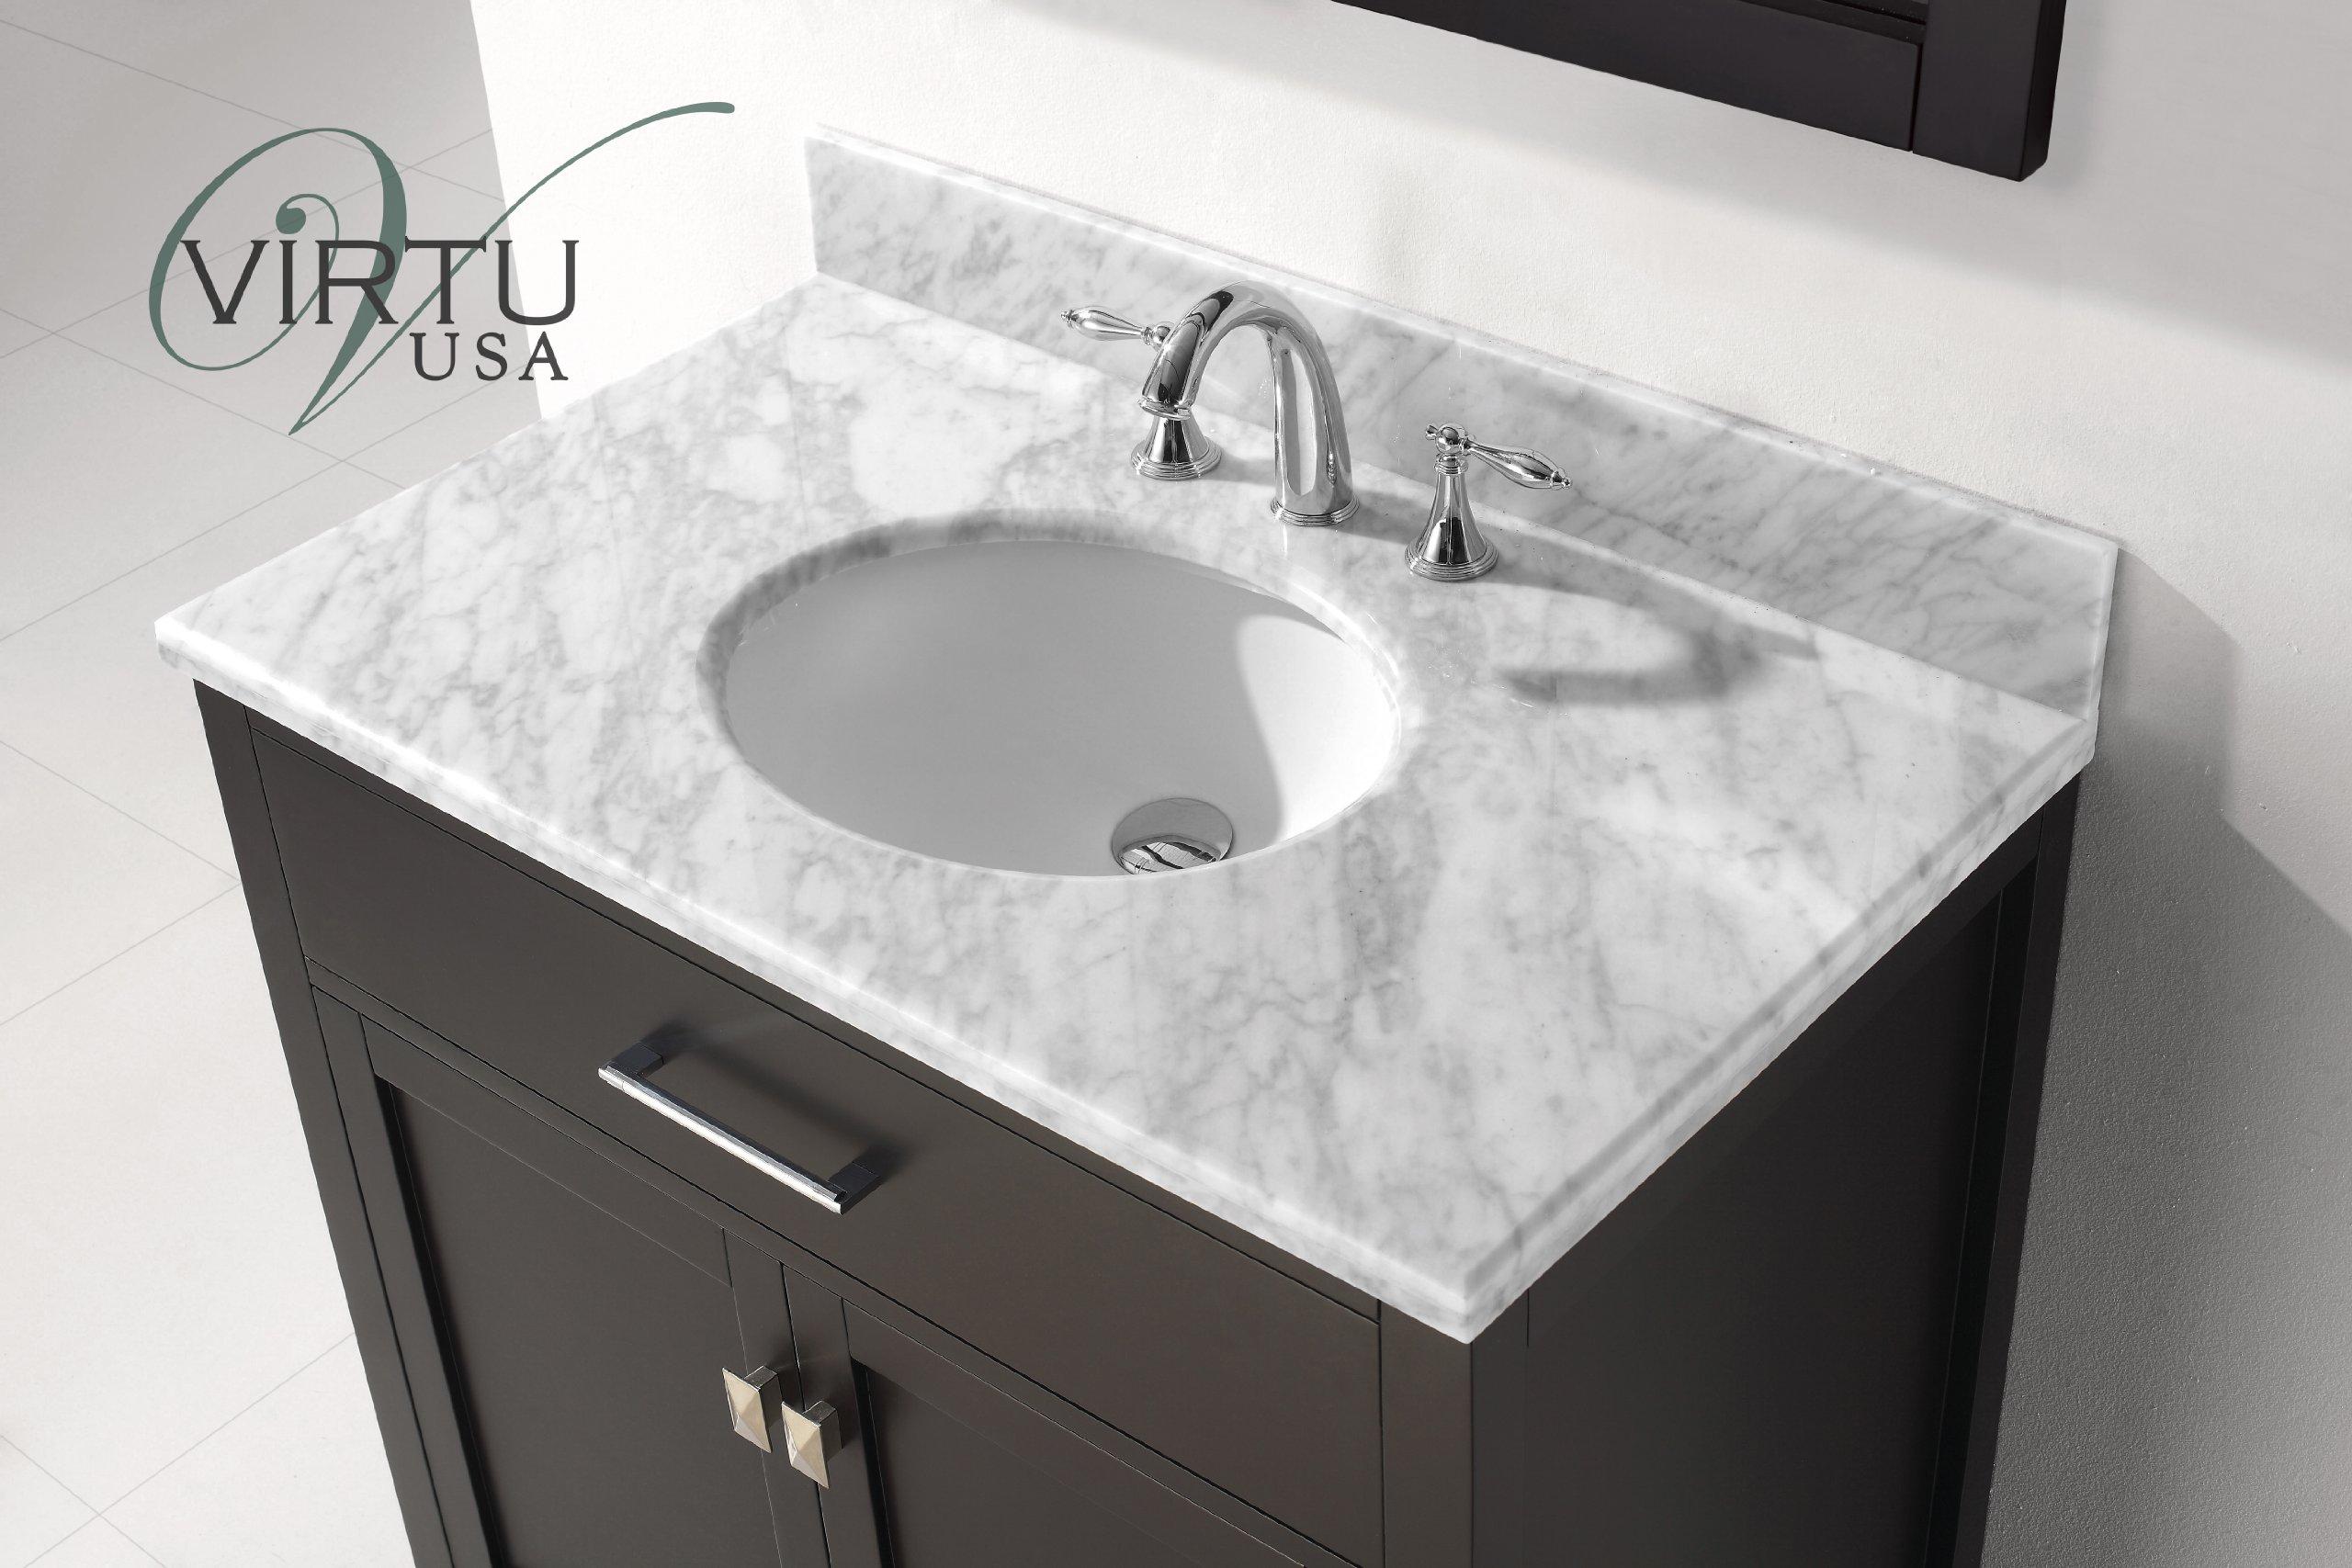 Virtu USA MS-2036-WMRO-ES Caroline 36-Inch Bathroom Vanity with Single Round Sink in Espresso and Italian Carrera White Marble by Virtu USA